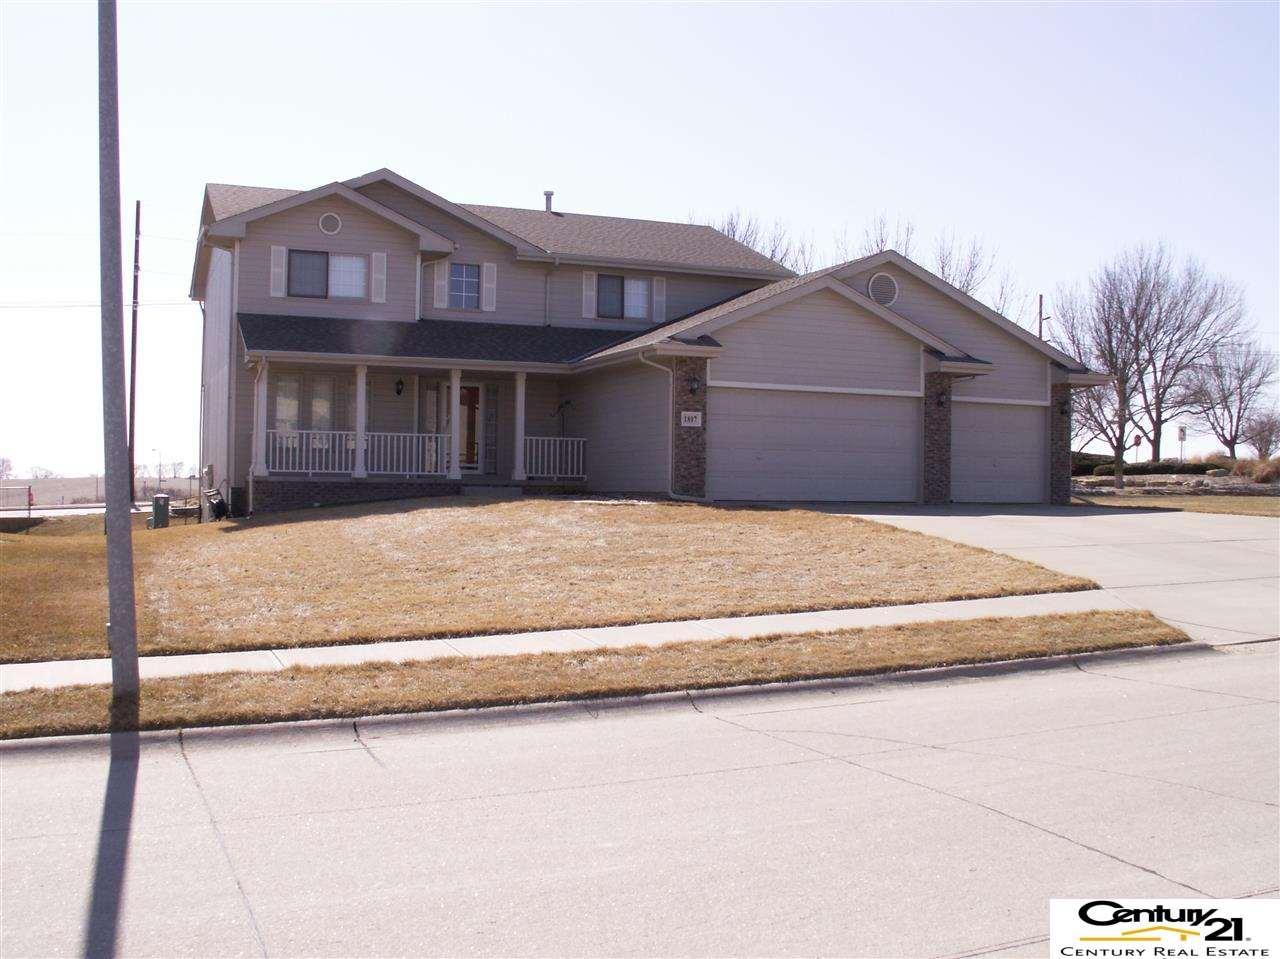 Rental Homes for Rent, ListingId:29544957, location: 1807 Old Gaelic Street Bellevue 68123